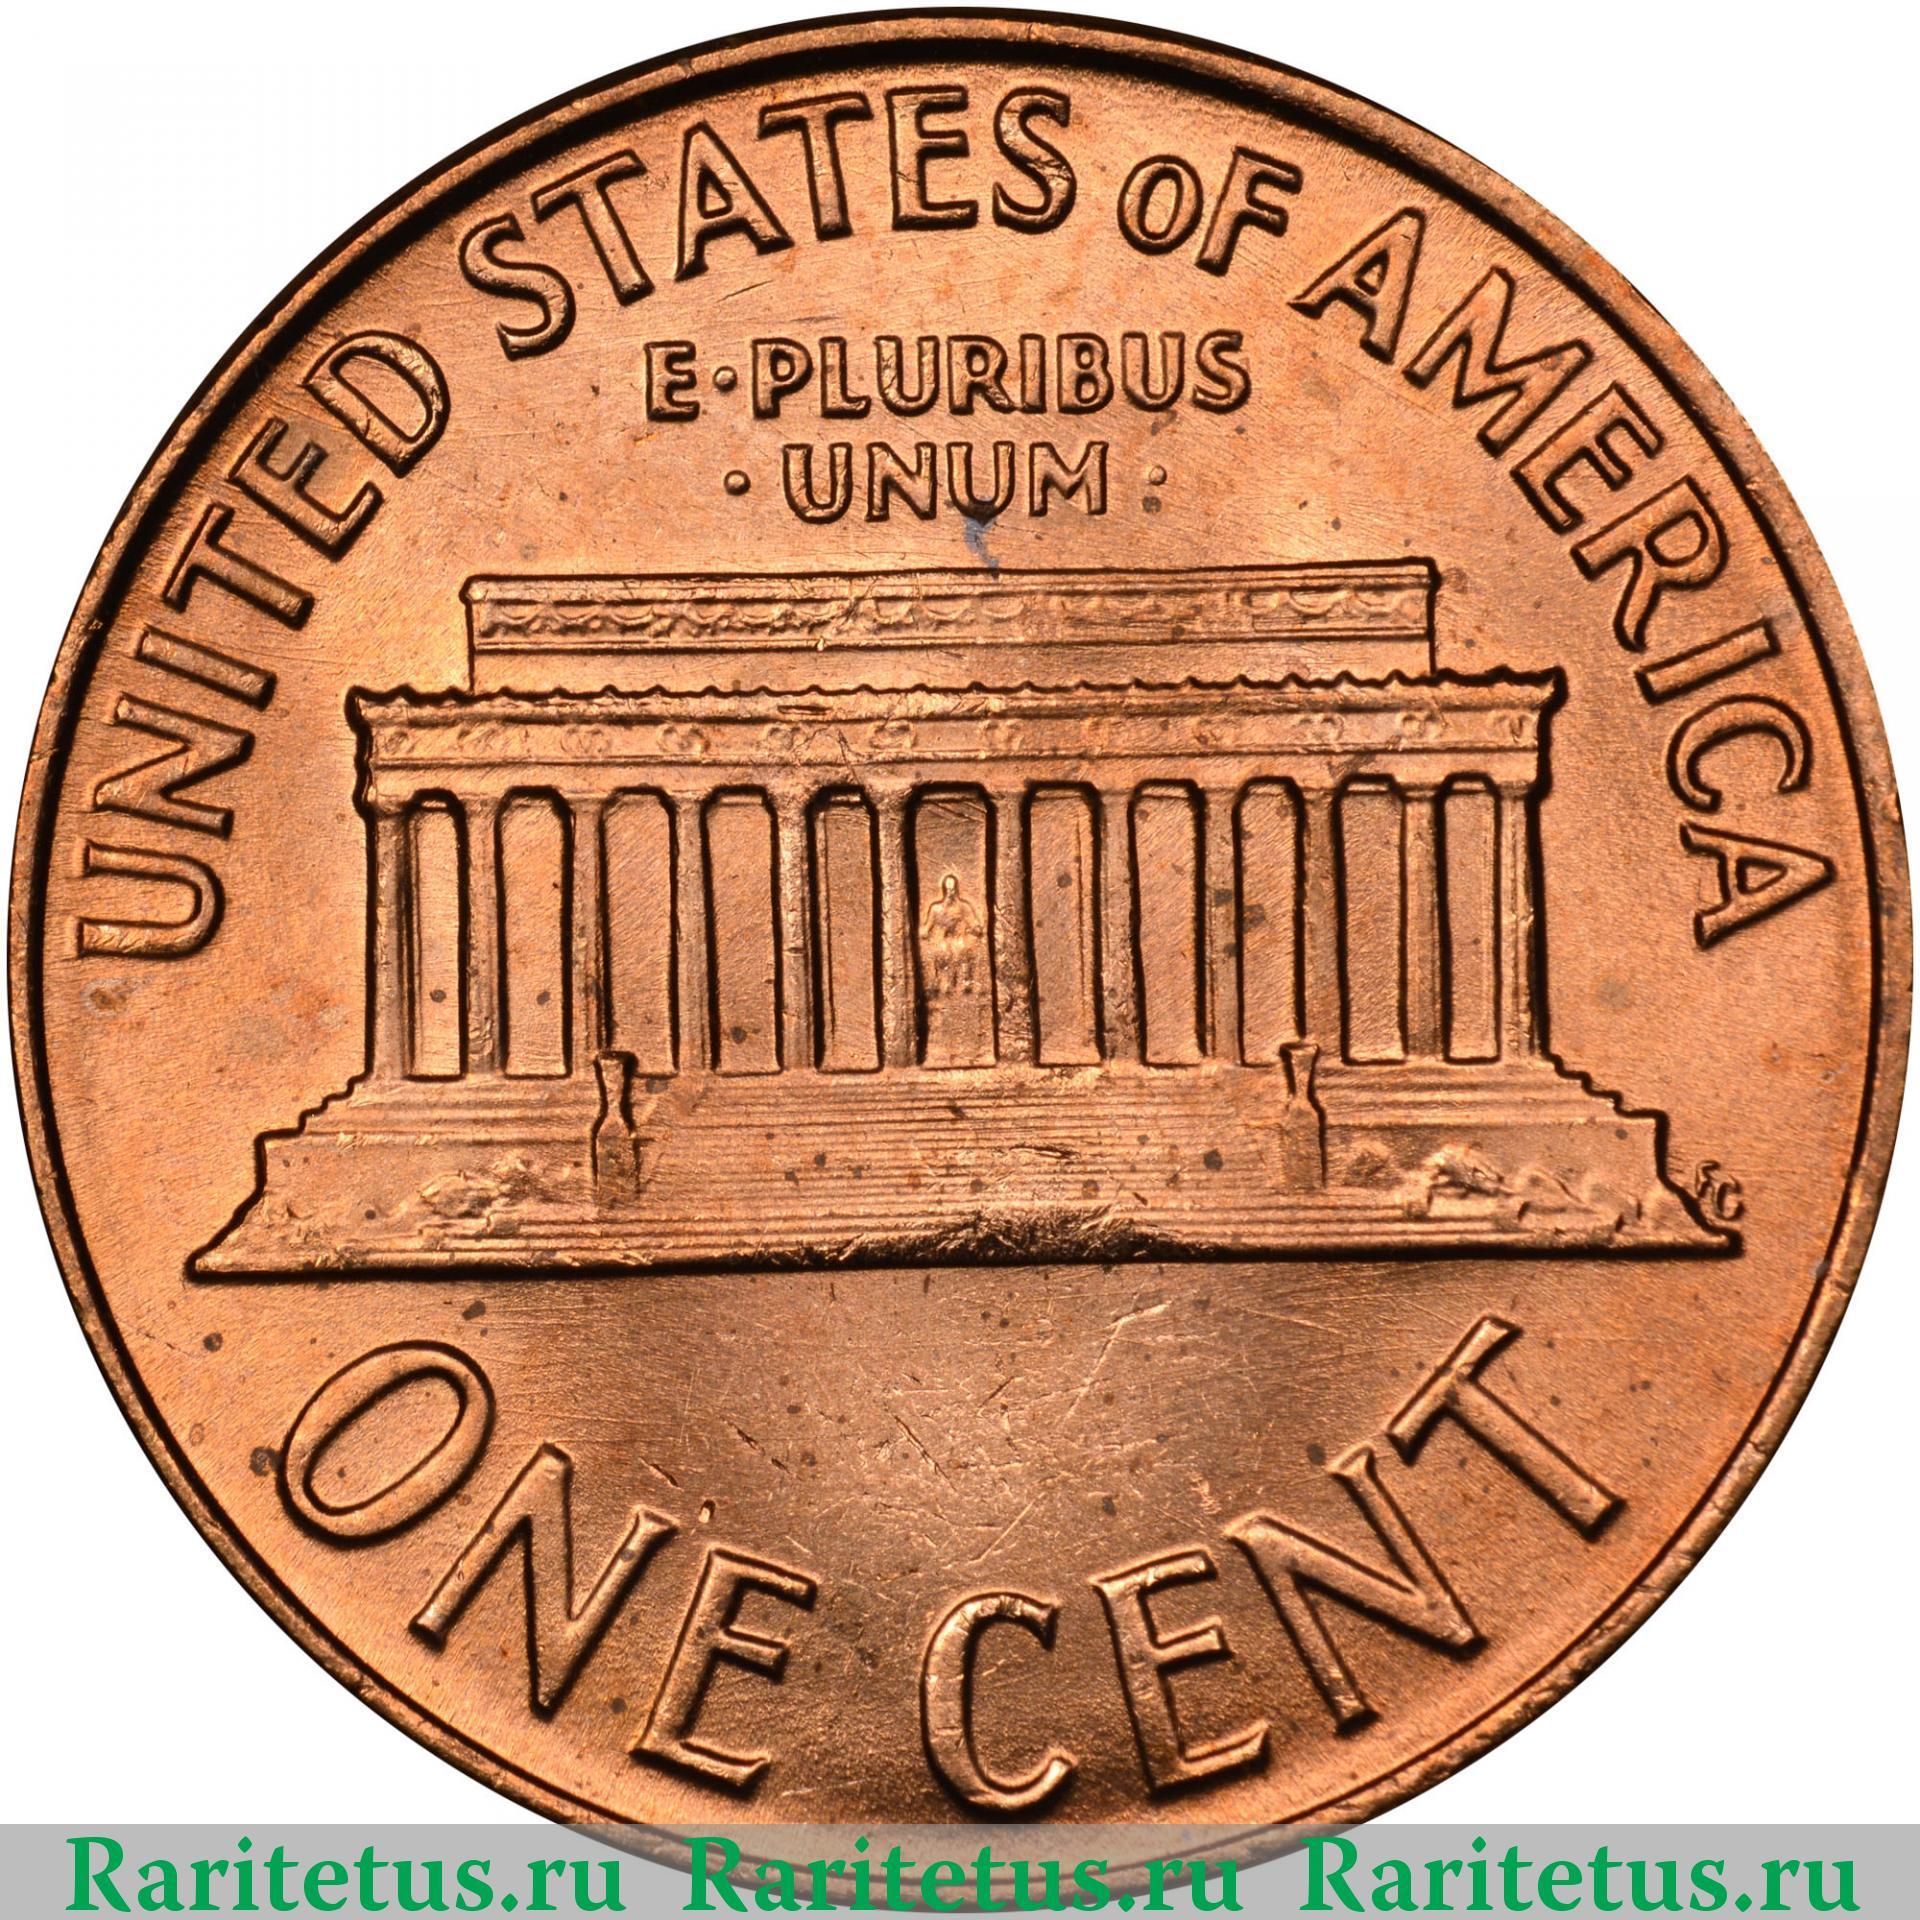 1цент одна копейка серебром 1840 года цена